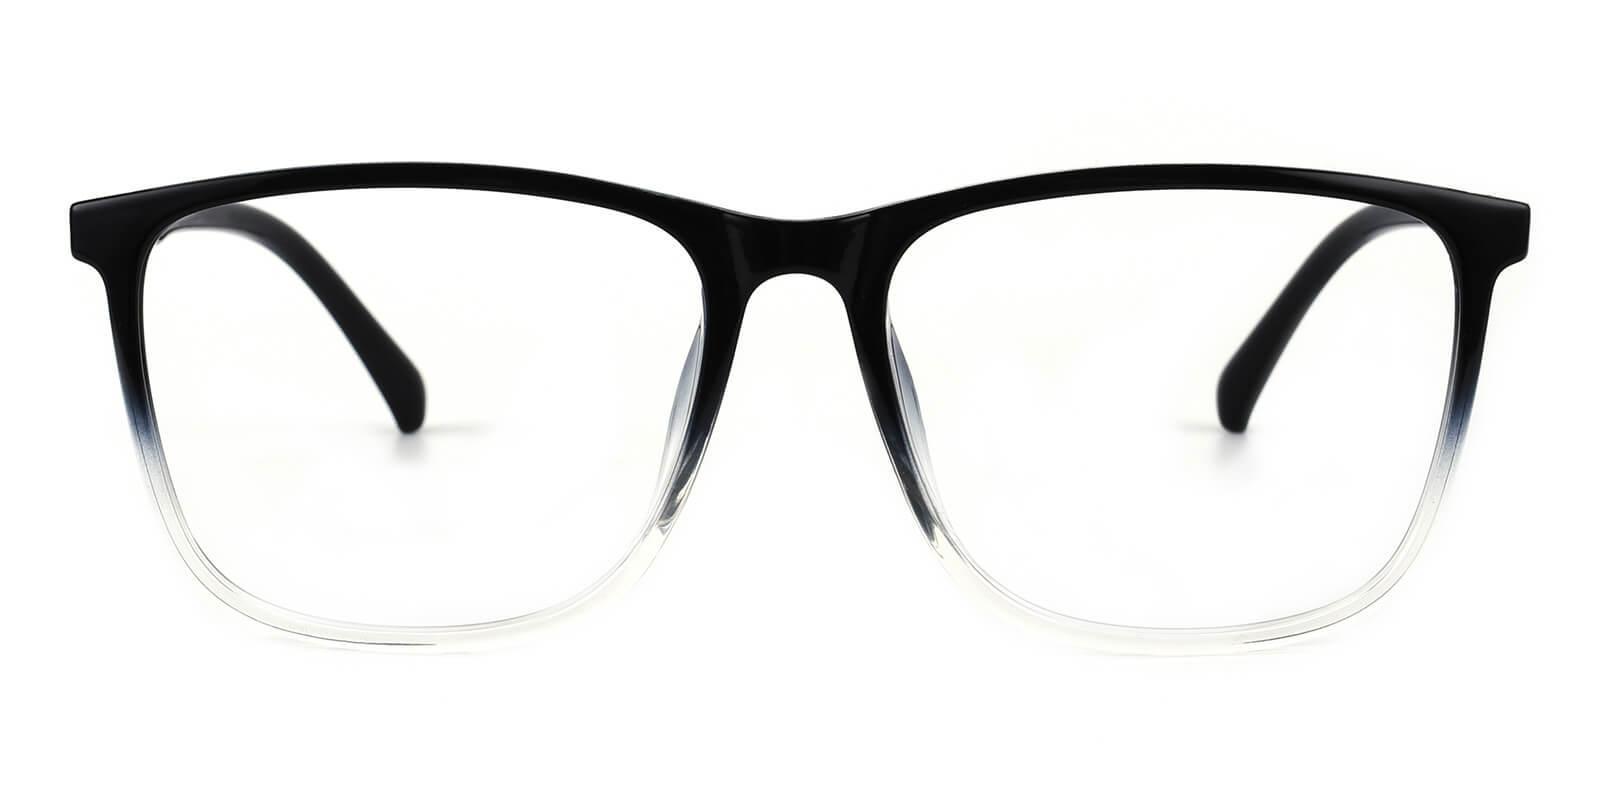 Poise-Black-Square-TR-Eyeglasses-additional2